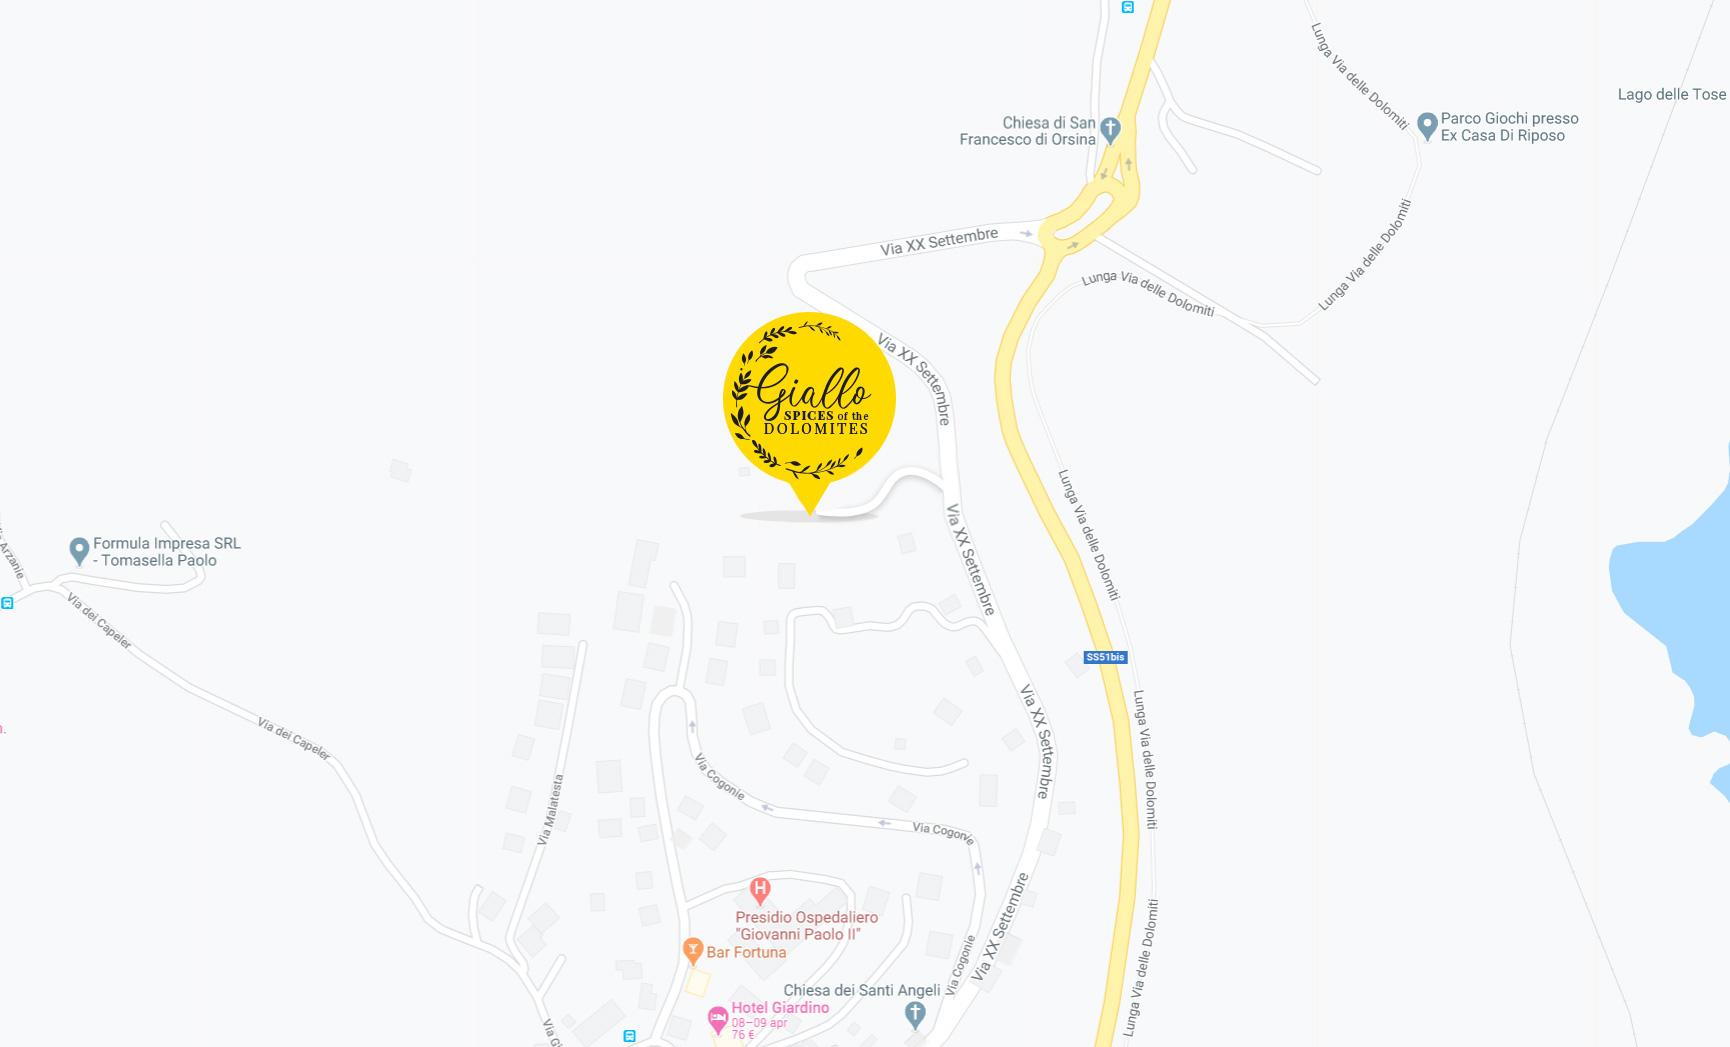 mappa giallo